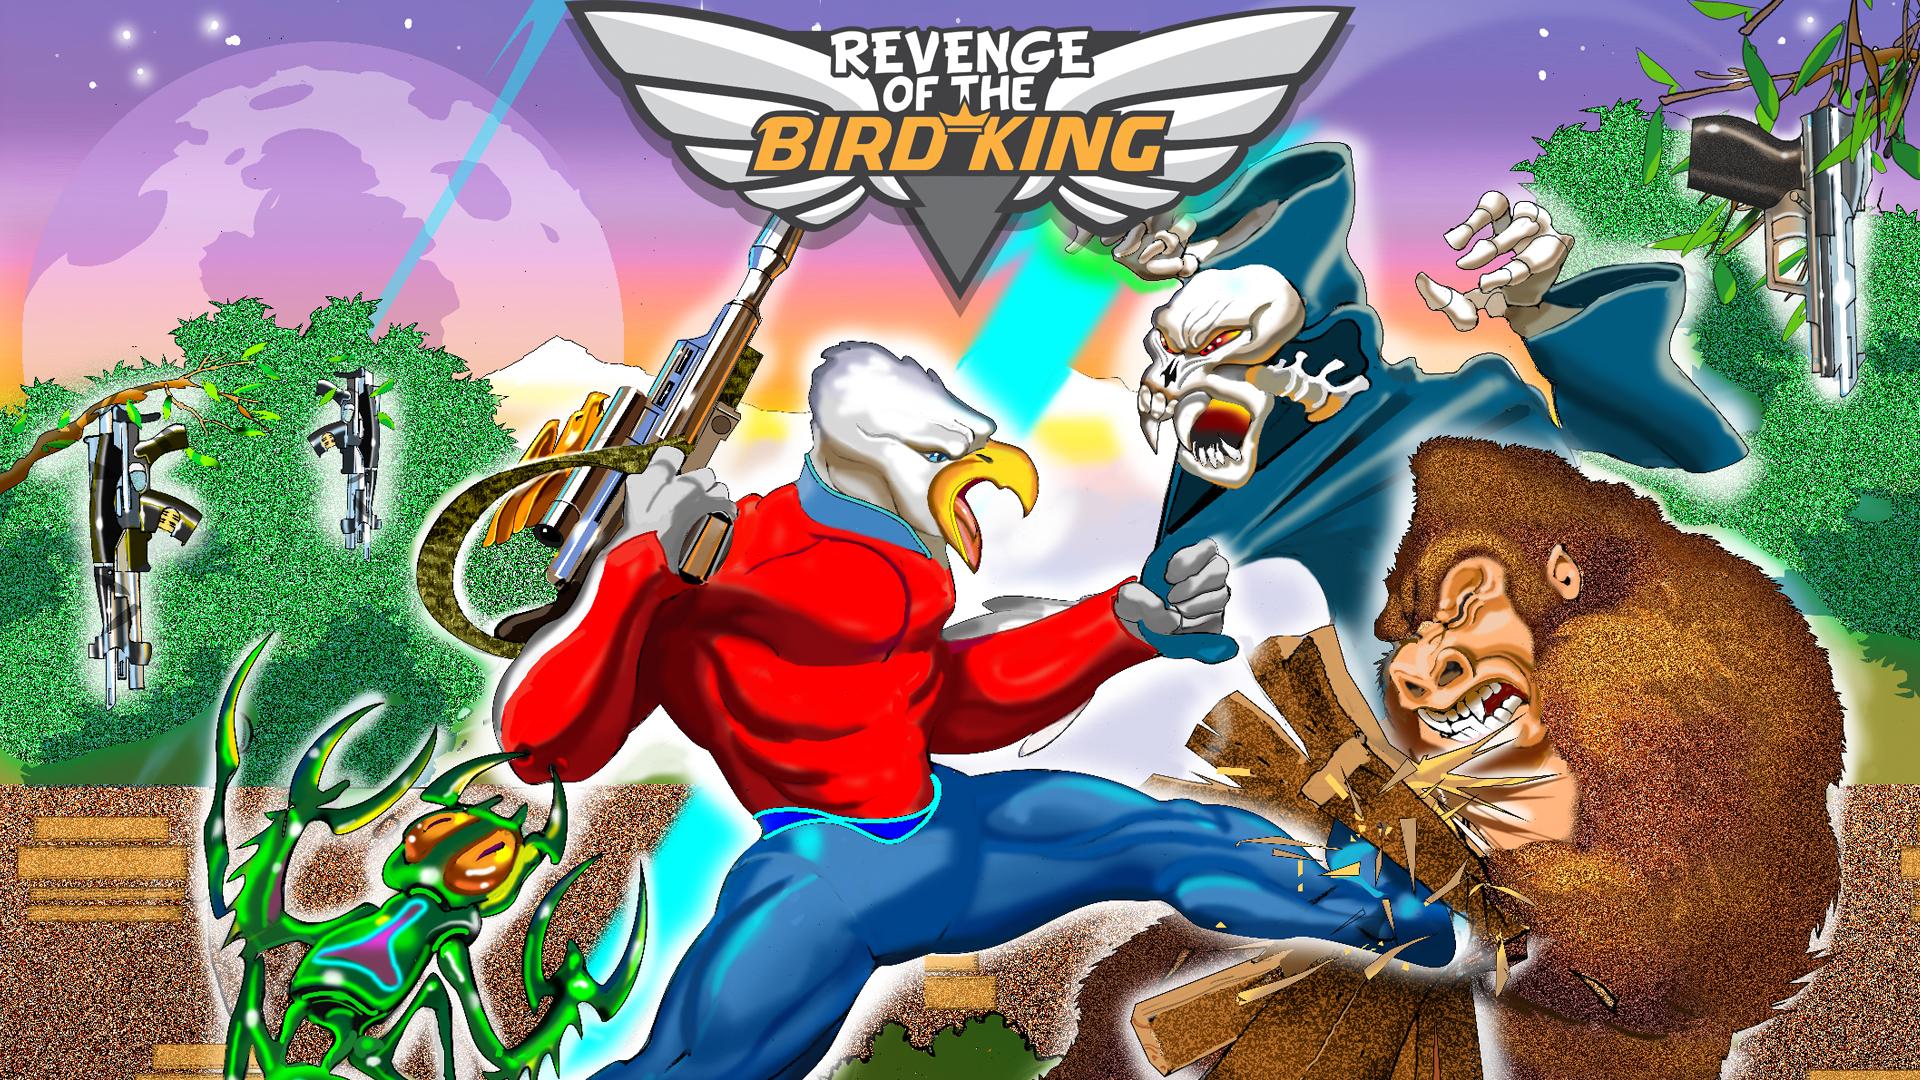 Nintendo eShop Revenge of the Bird King $0.01